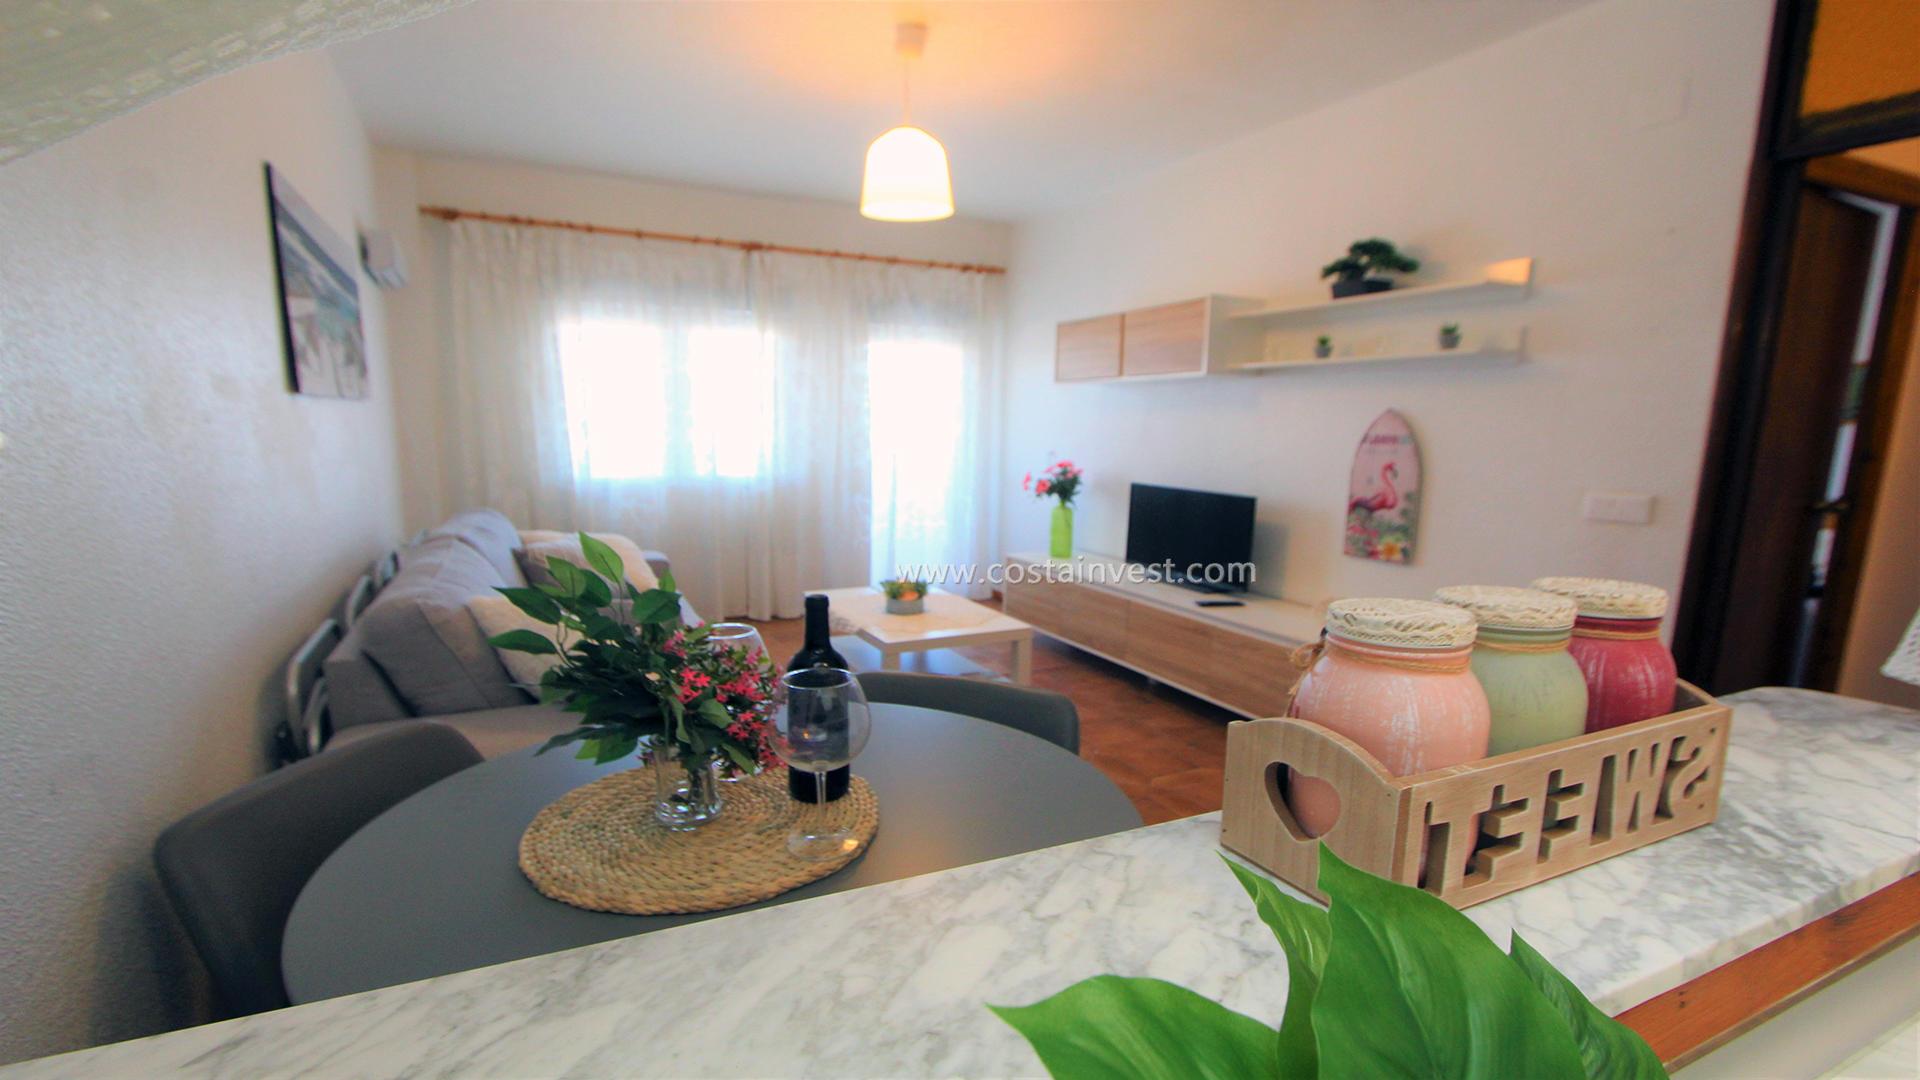 Apartament -                                       Orihuela Costa -                                       1 sypialnie -                                       4 osoby